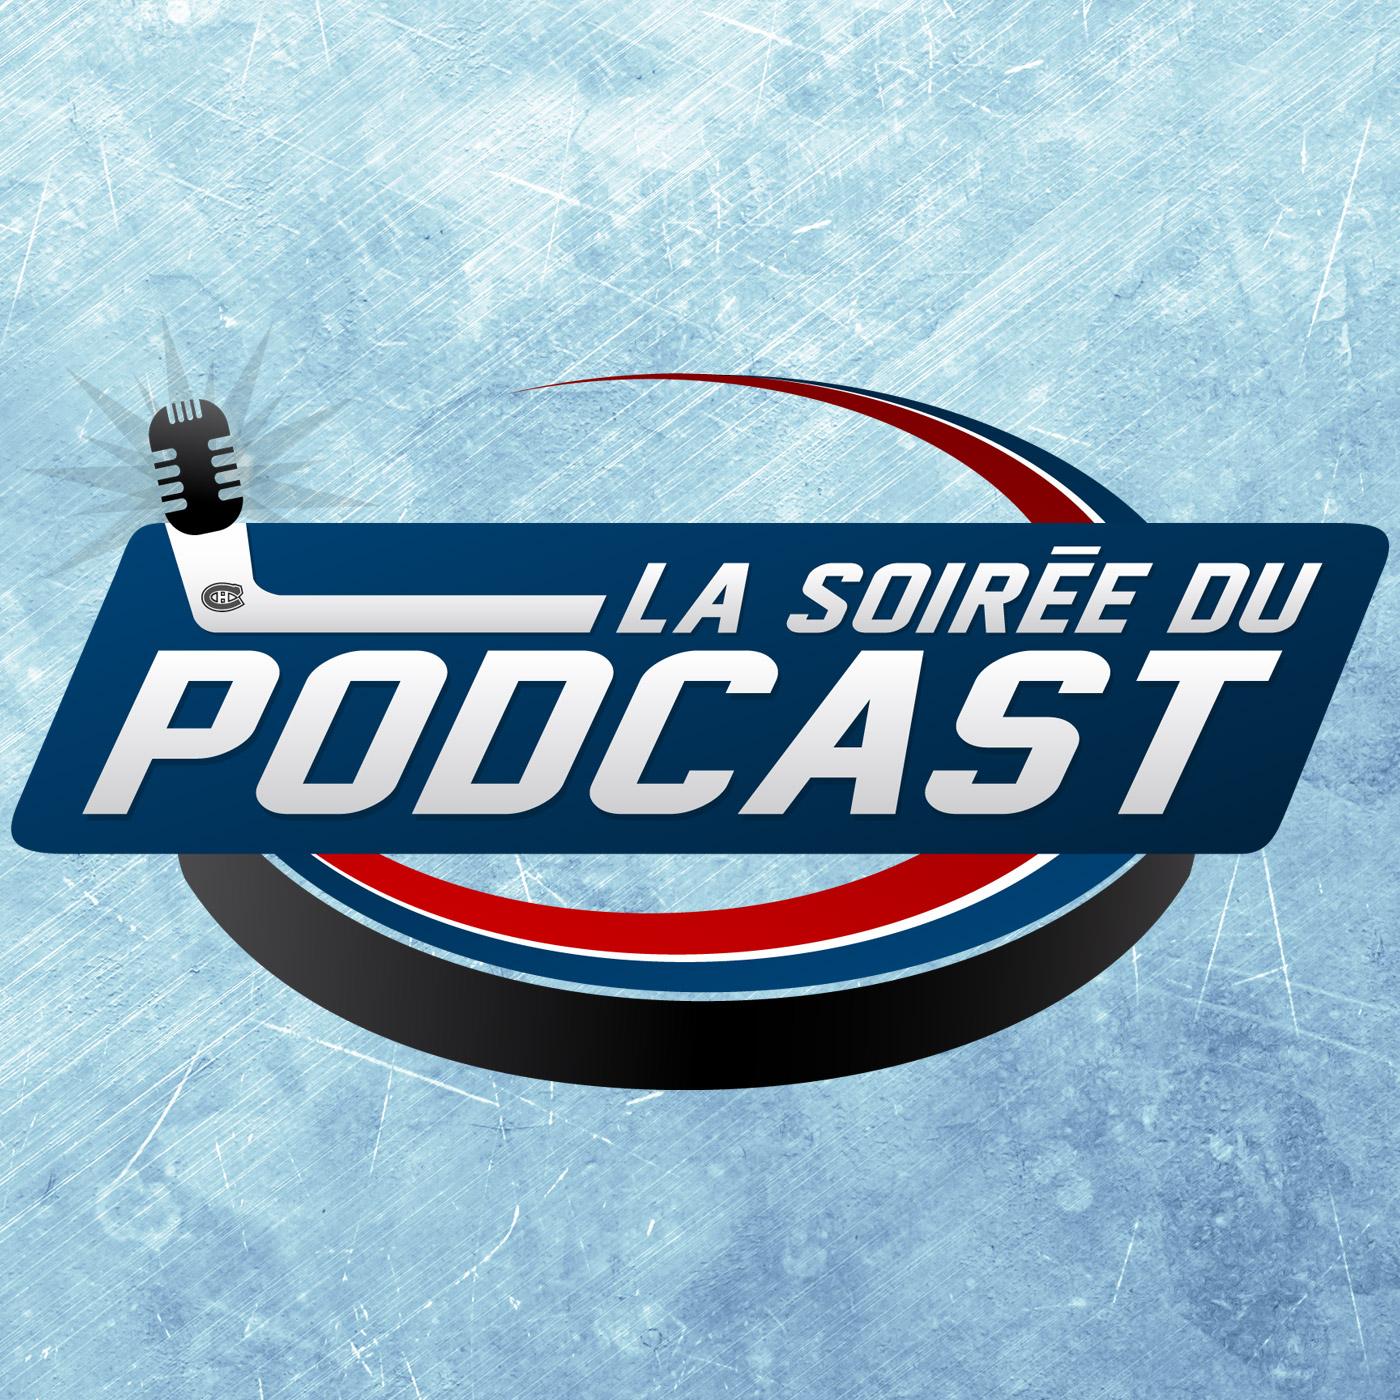 La Soirée Du Podcast - Podcast Hockey - Propulsé par Yoink! Média